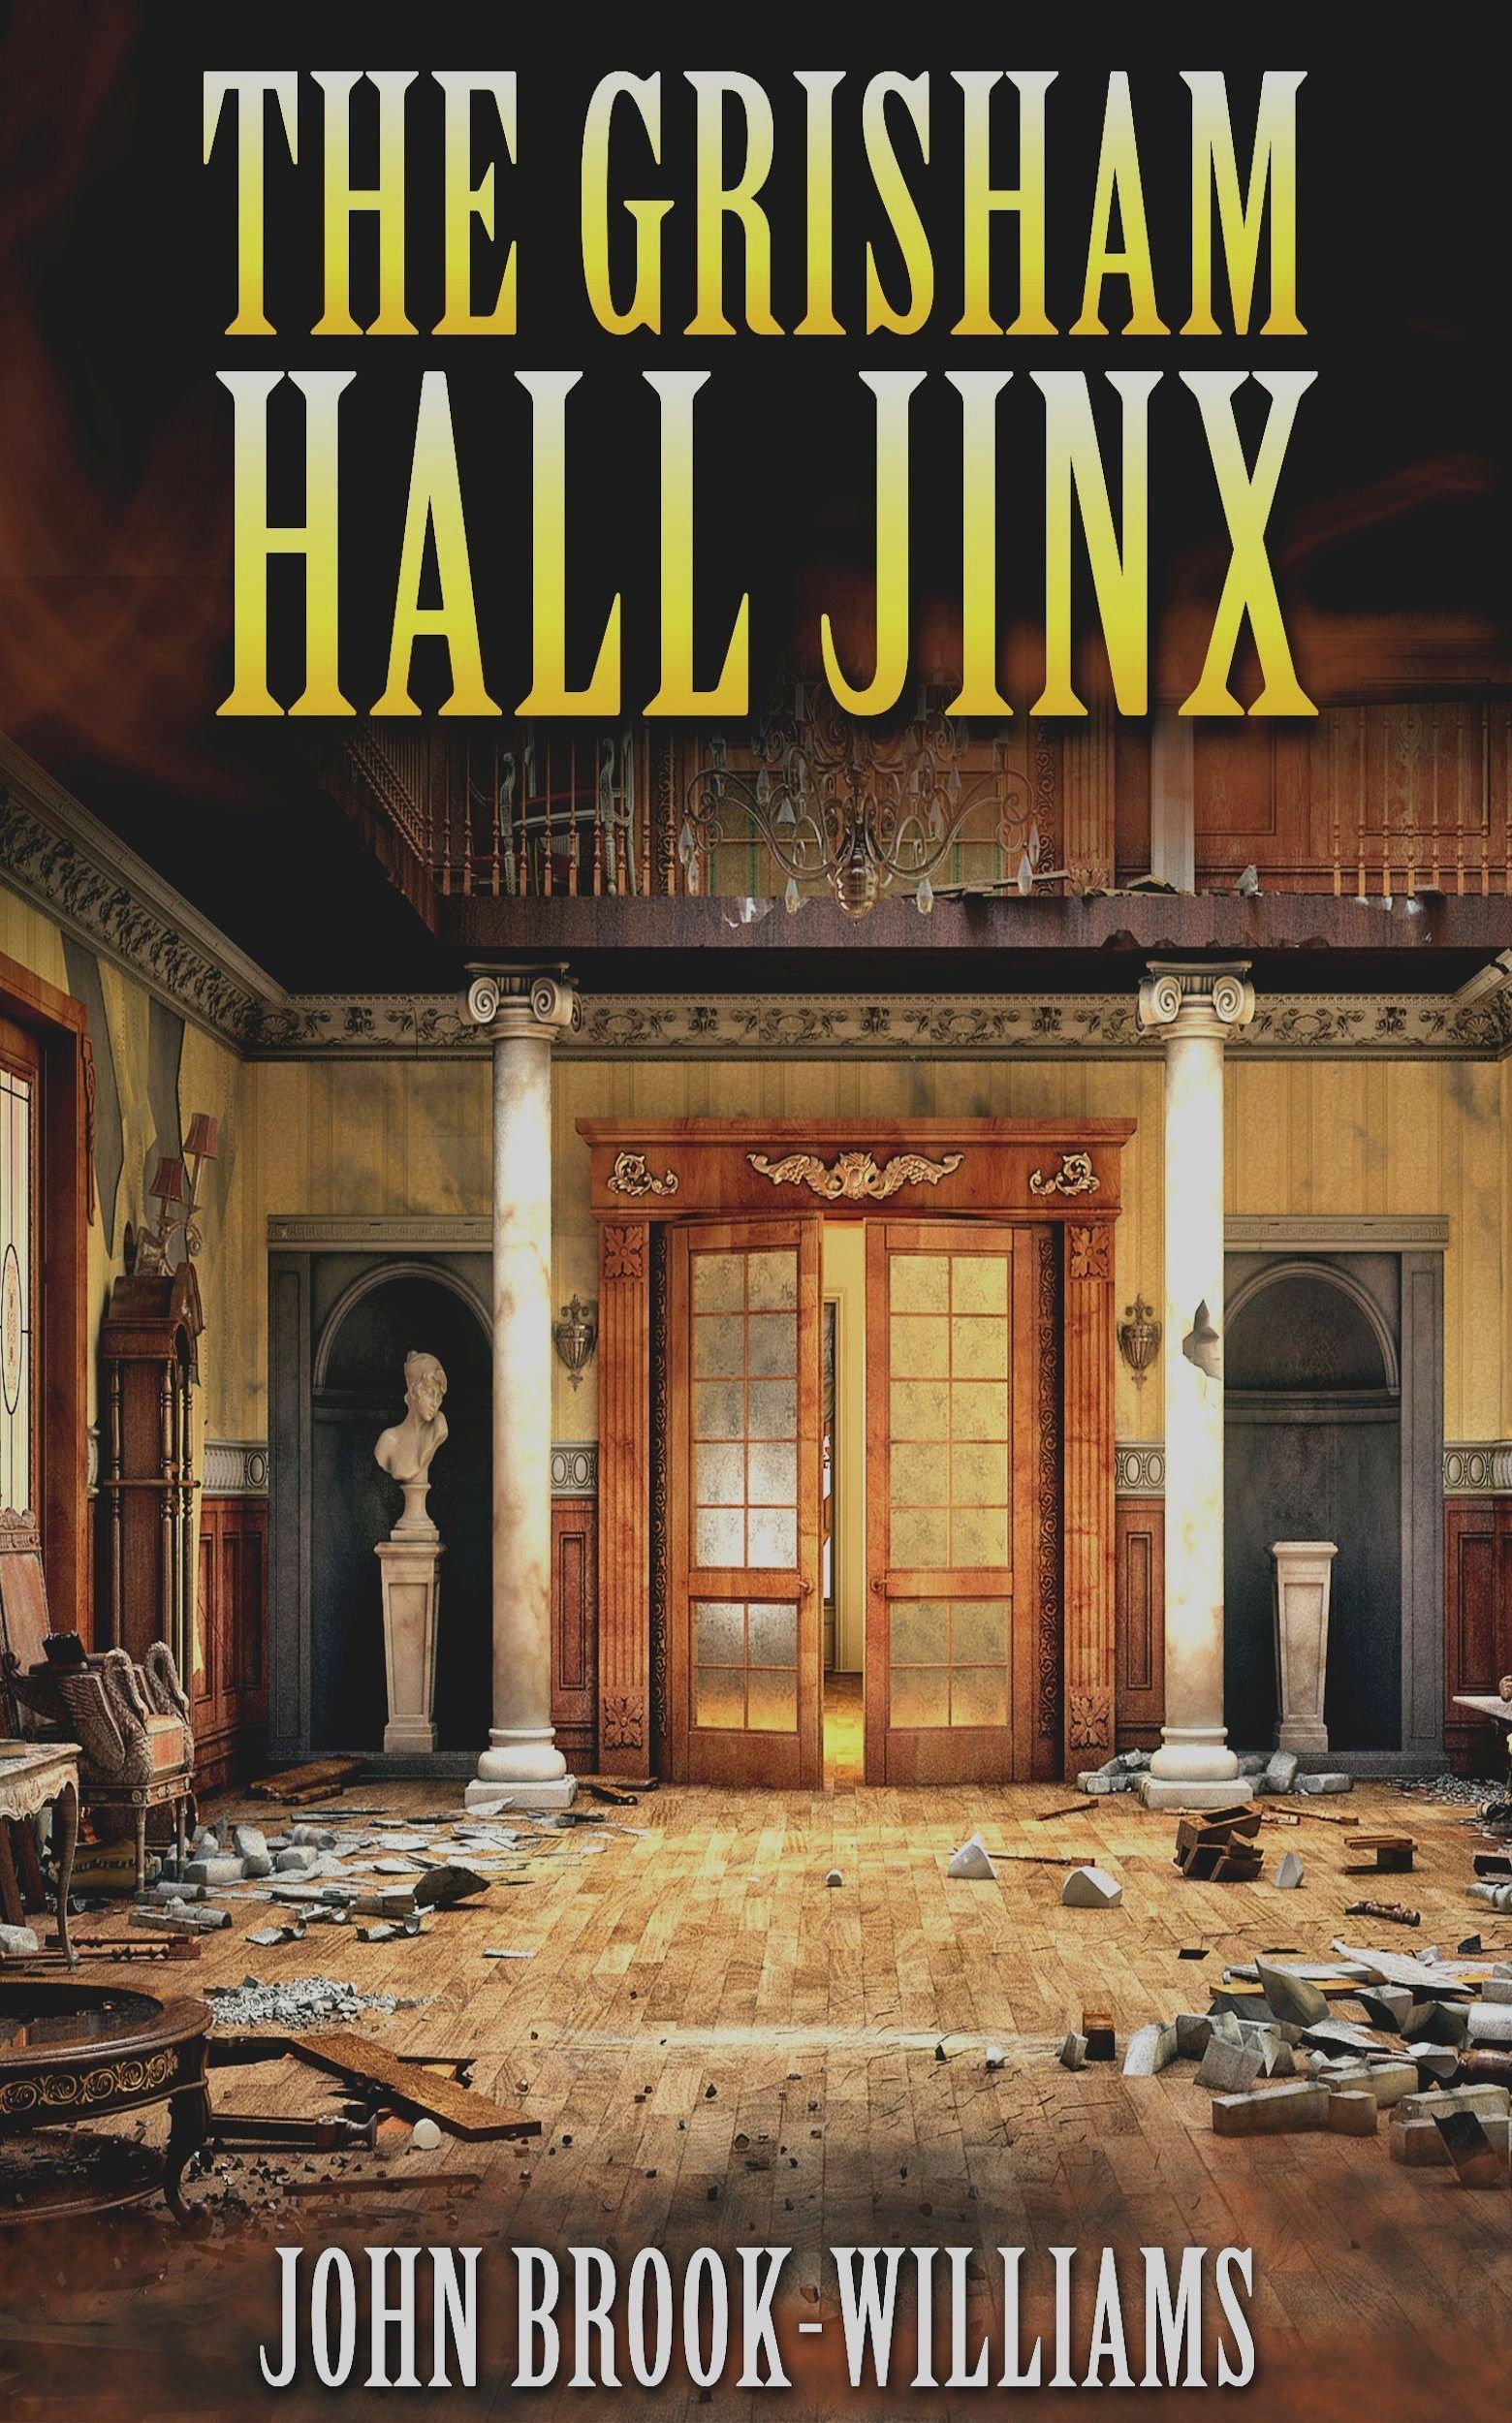 THE GRISHAM HALL JINX